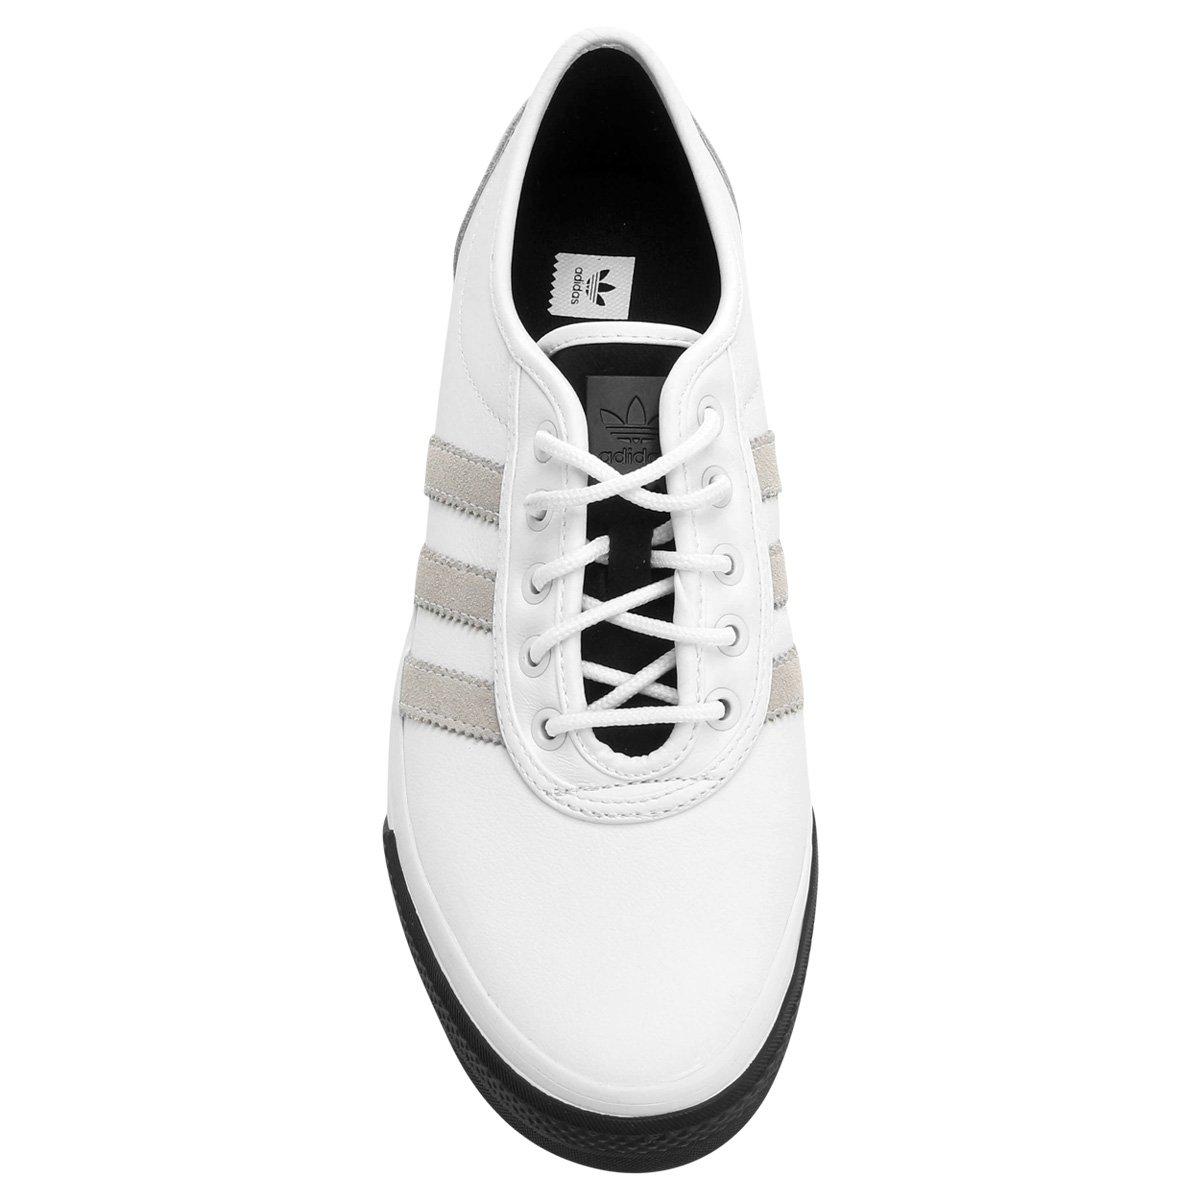 d537903c5b704 Tênis Adidas Adi Ease Class - Compre Agora